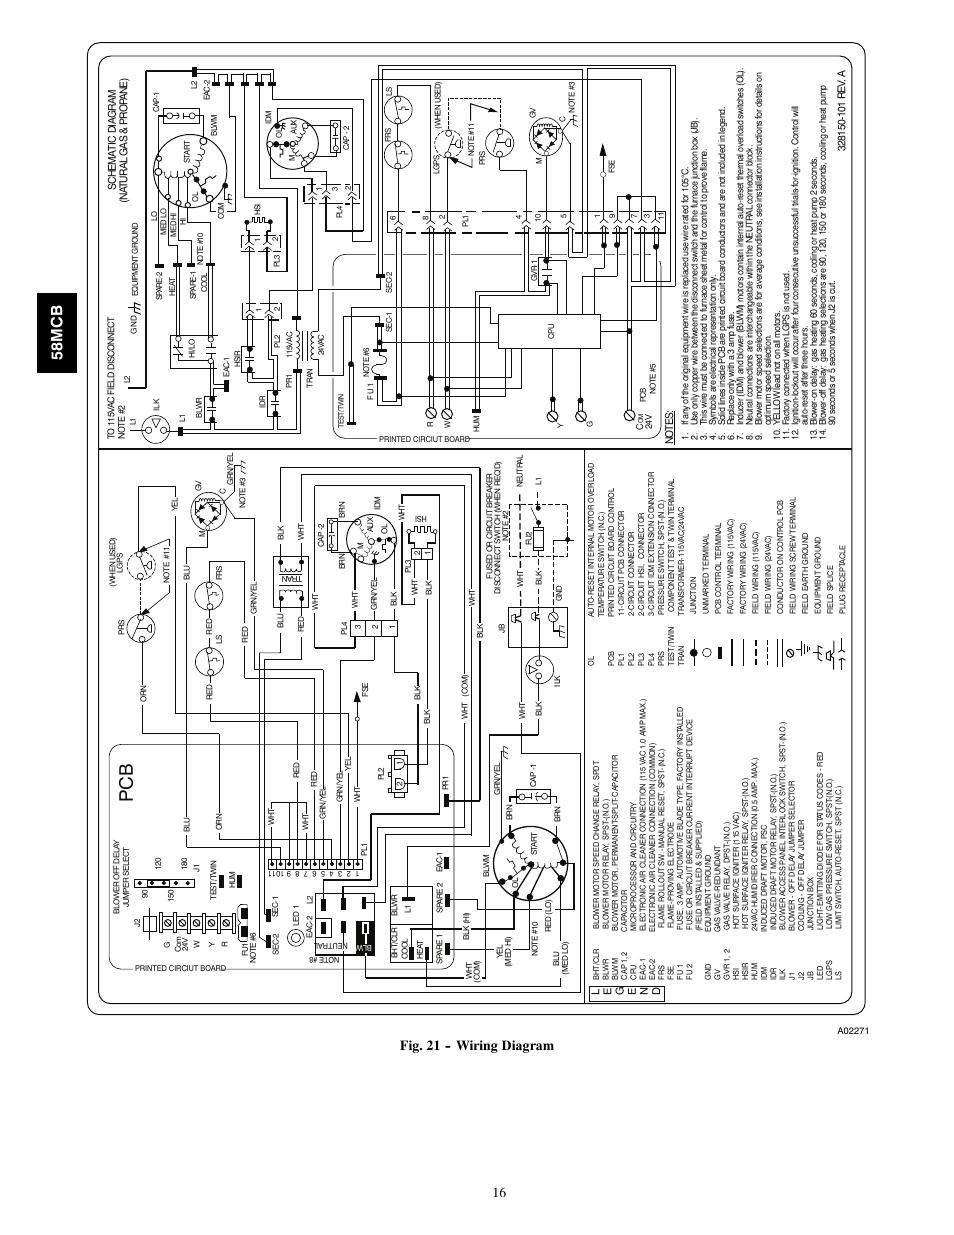 58mc B Fig 21 Wiring Diagram Carrier 58mcb User Manual Page 115 Vac Plug